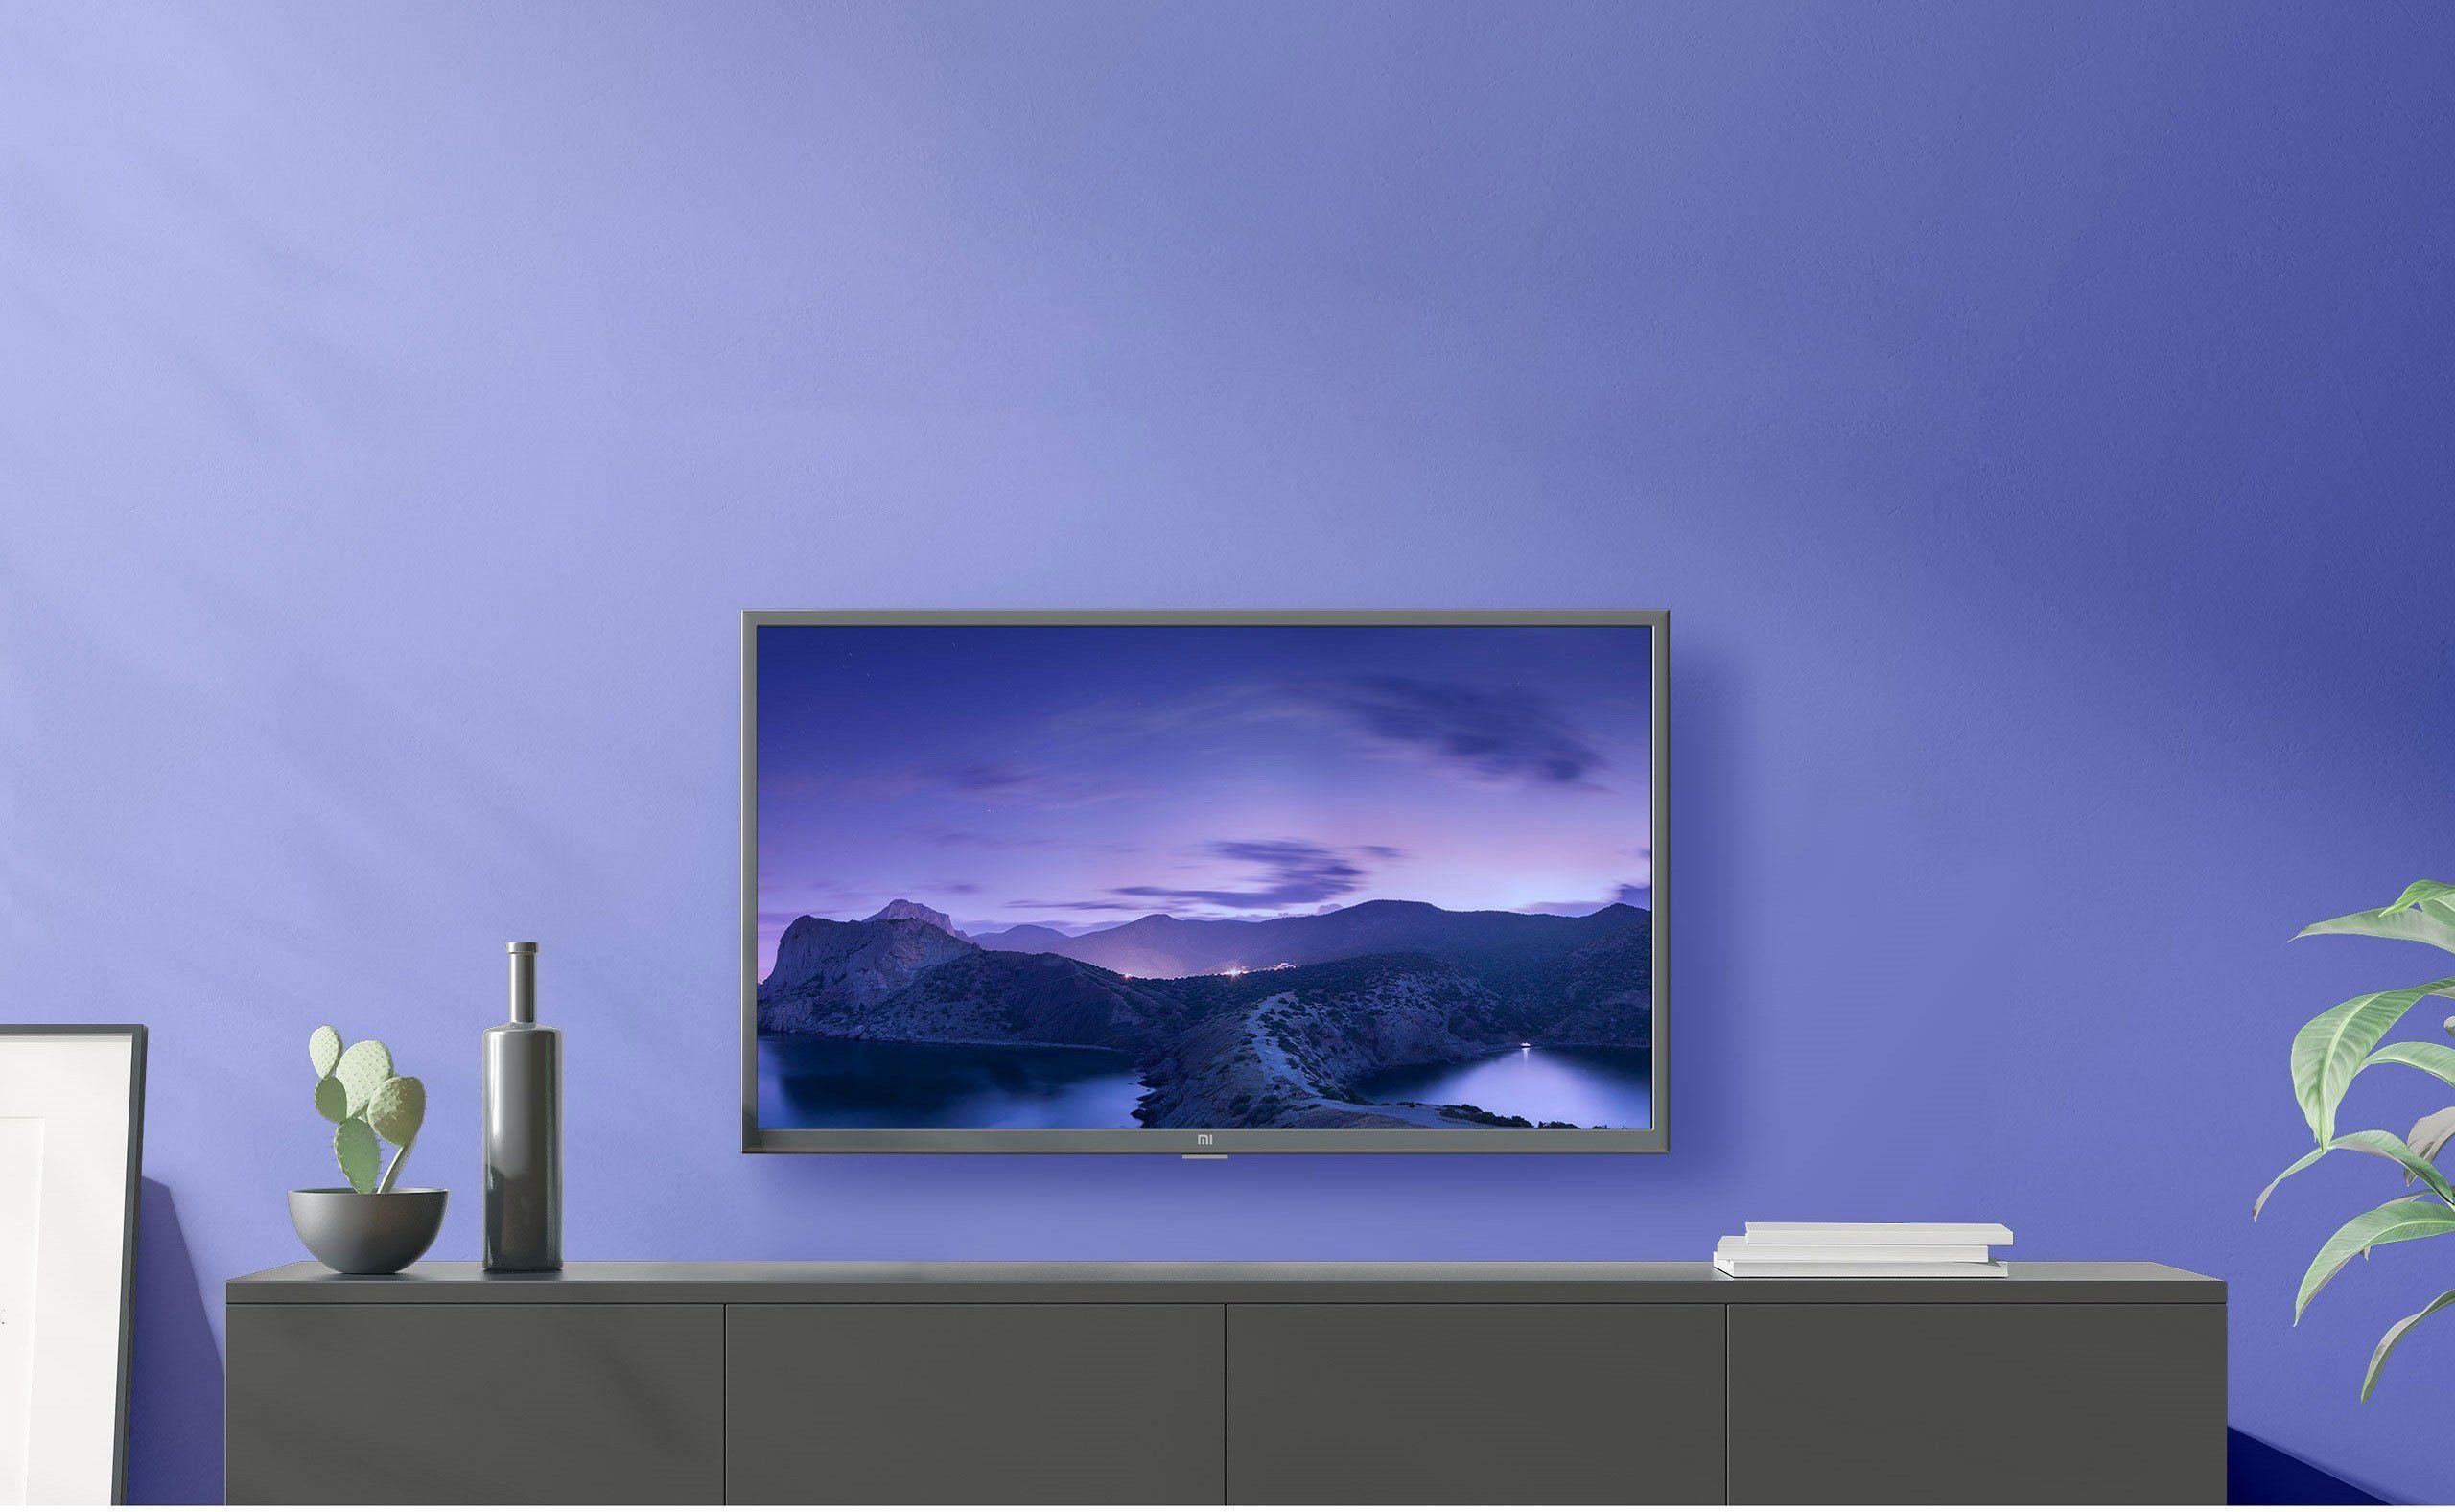 Mi TV 4A Pro 32